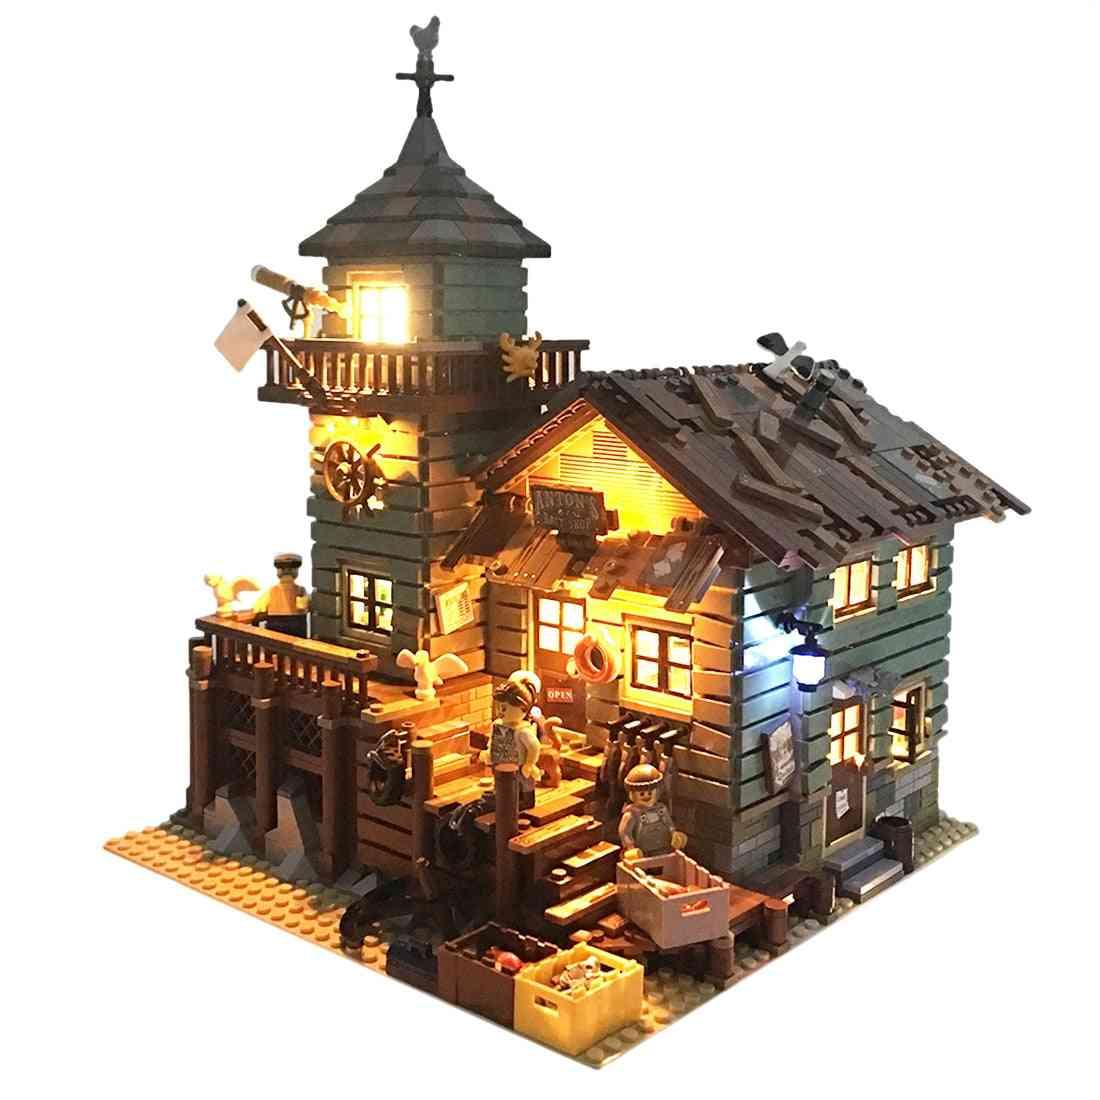 Diy Building Blocks, Usb Luminous Led Lighting Kit For Fisherman's Hut